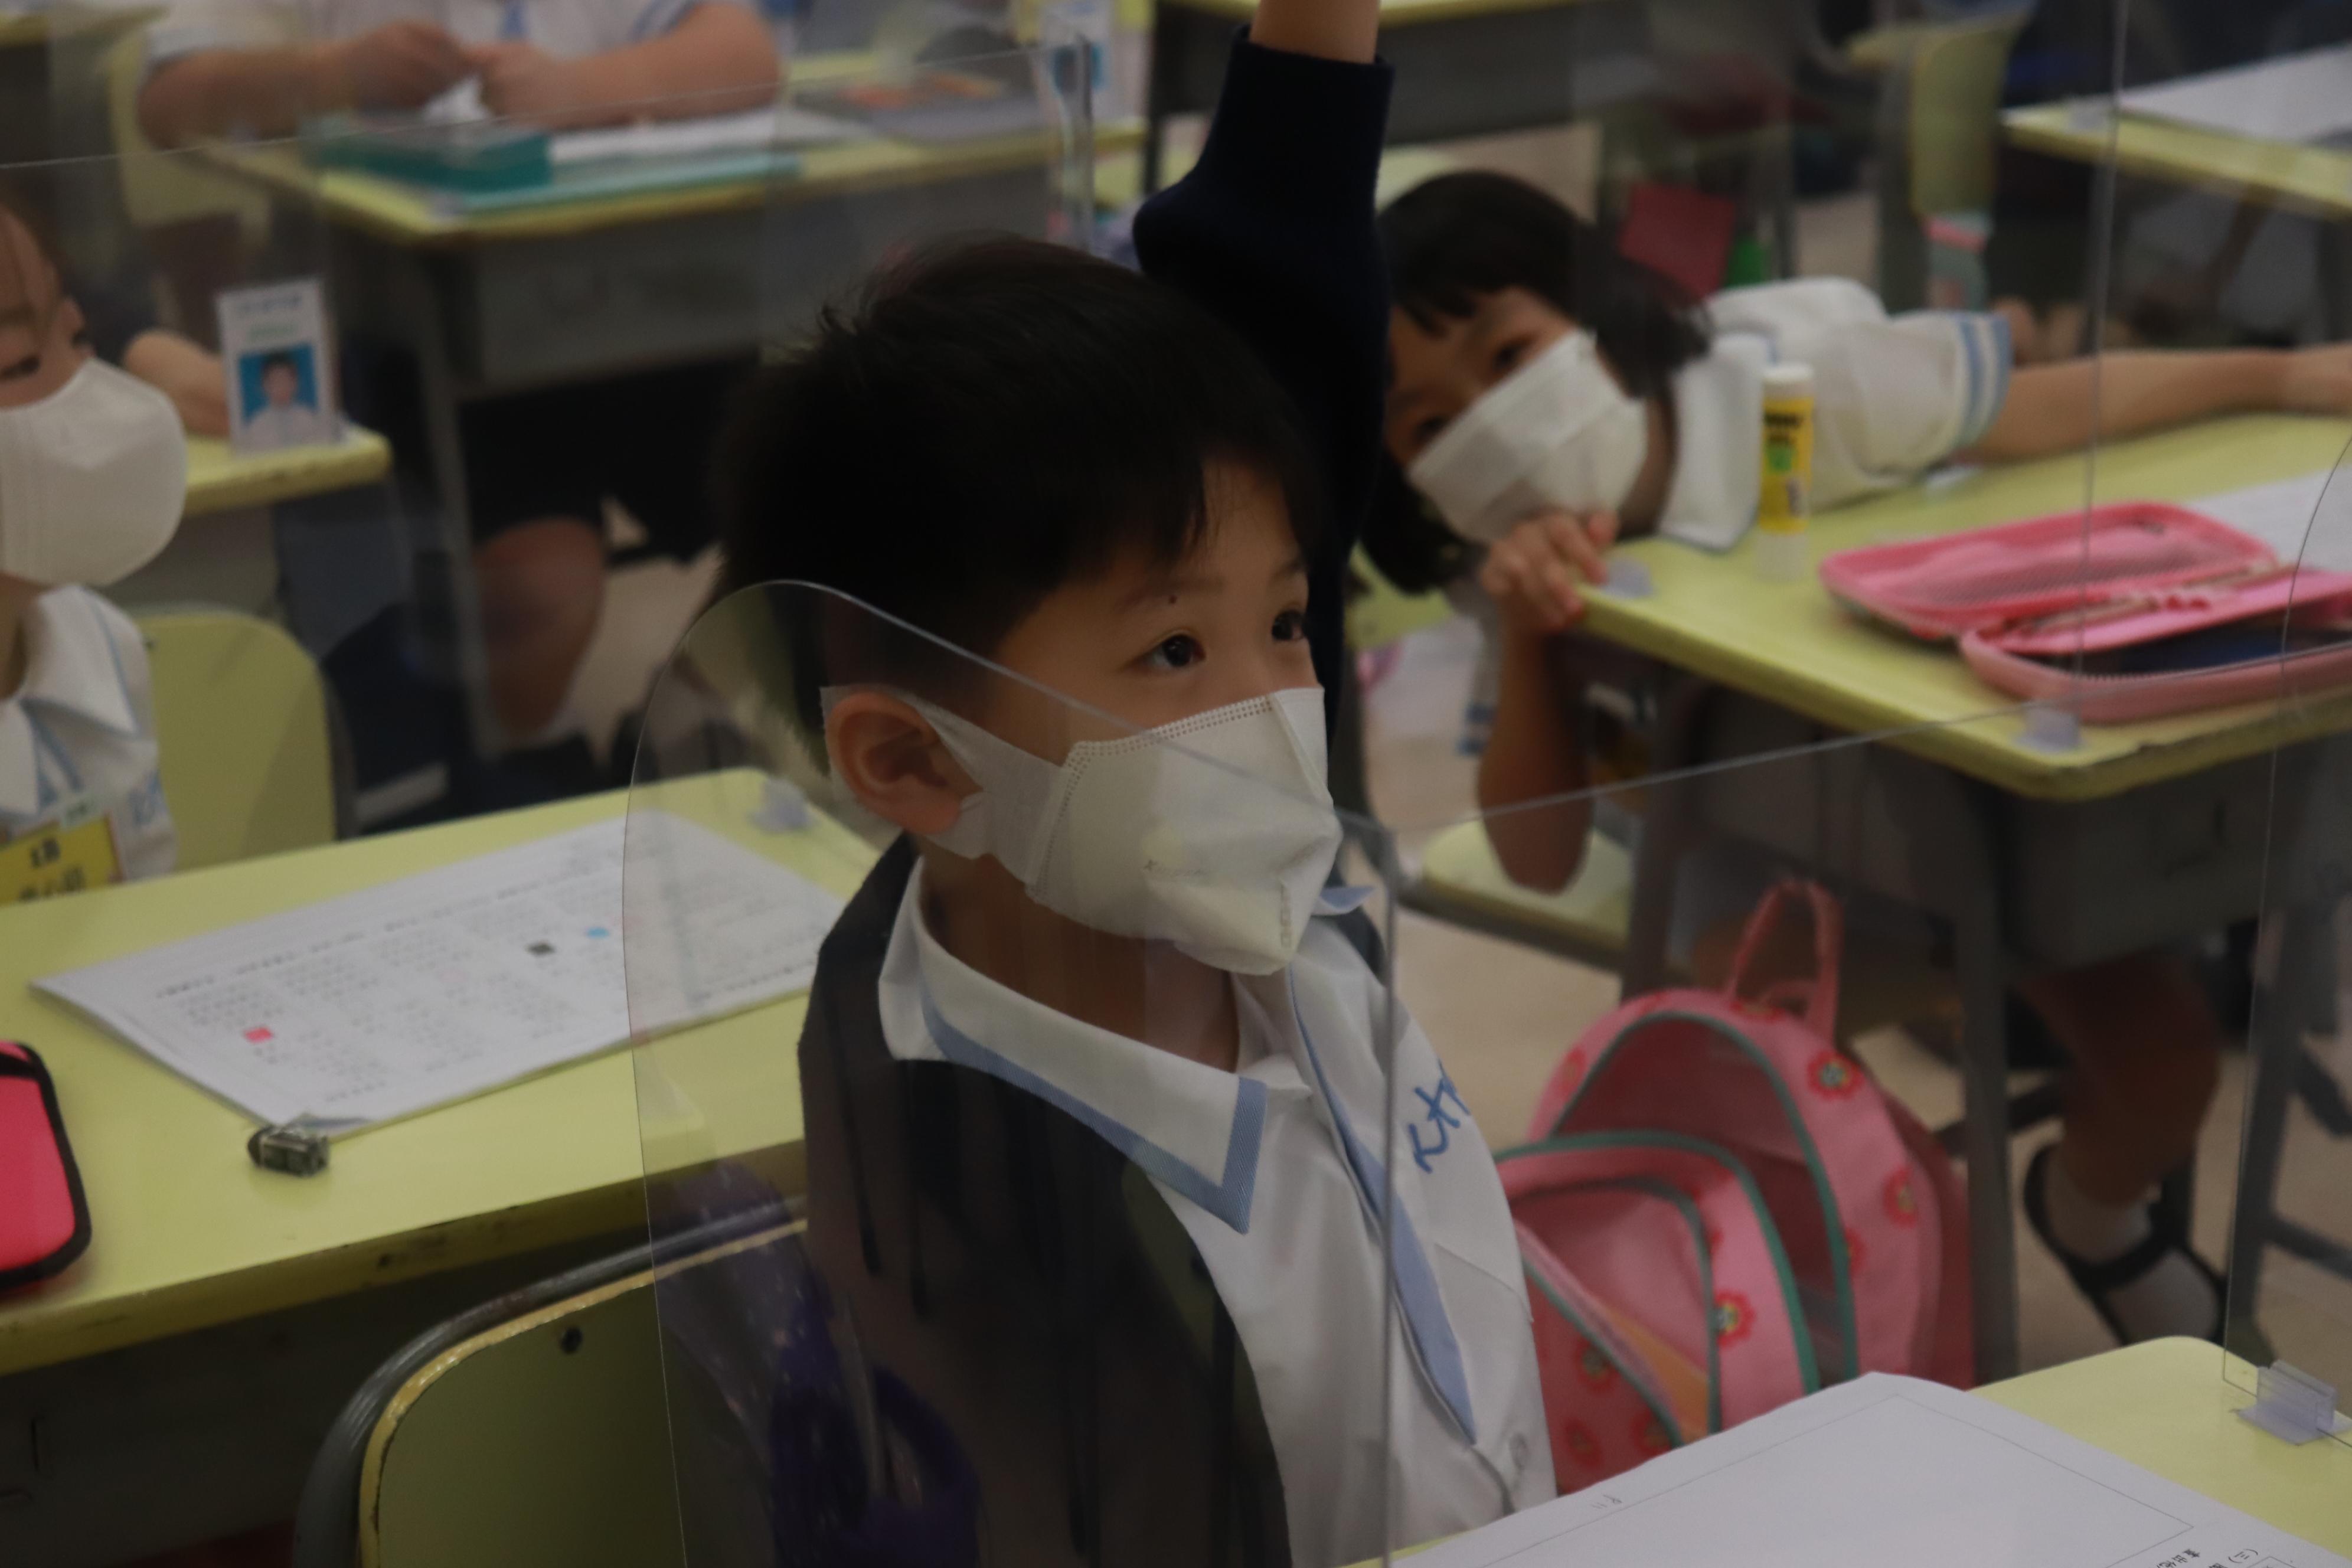 http://keito.school.hk/sites/default/files/img_6685.jpg